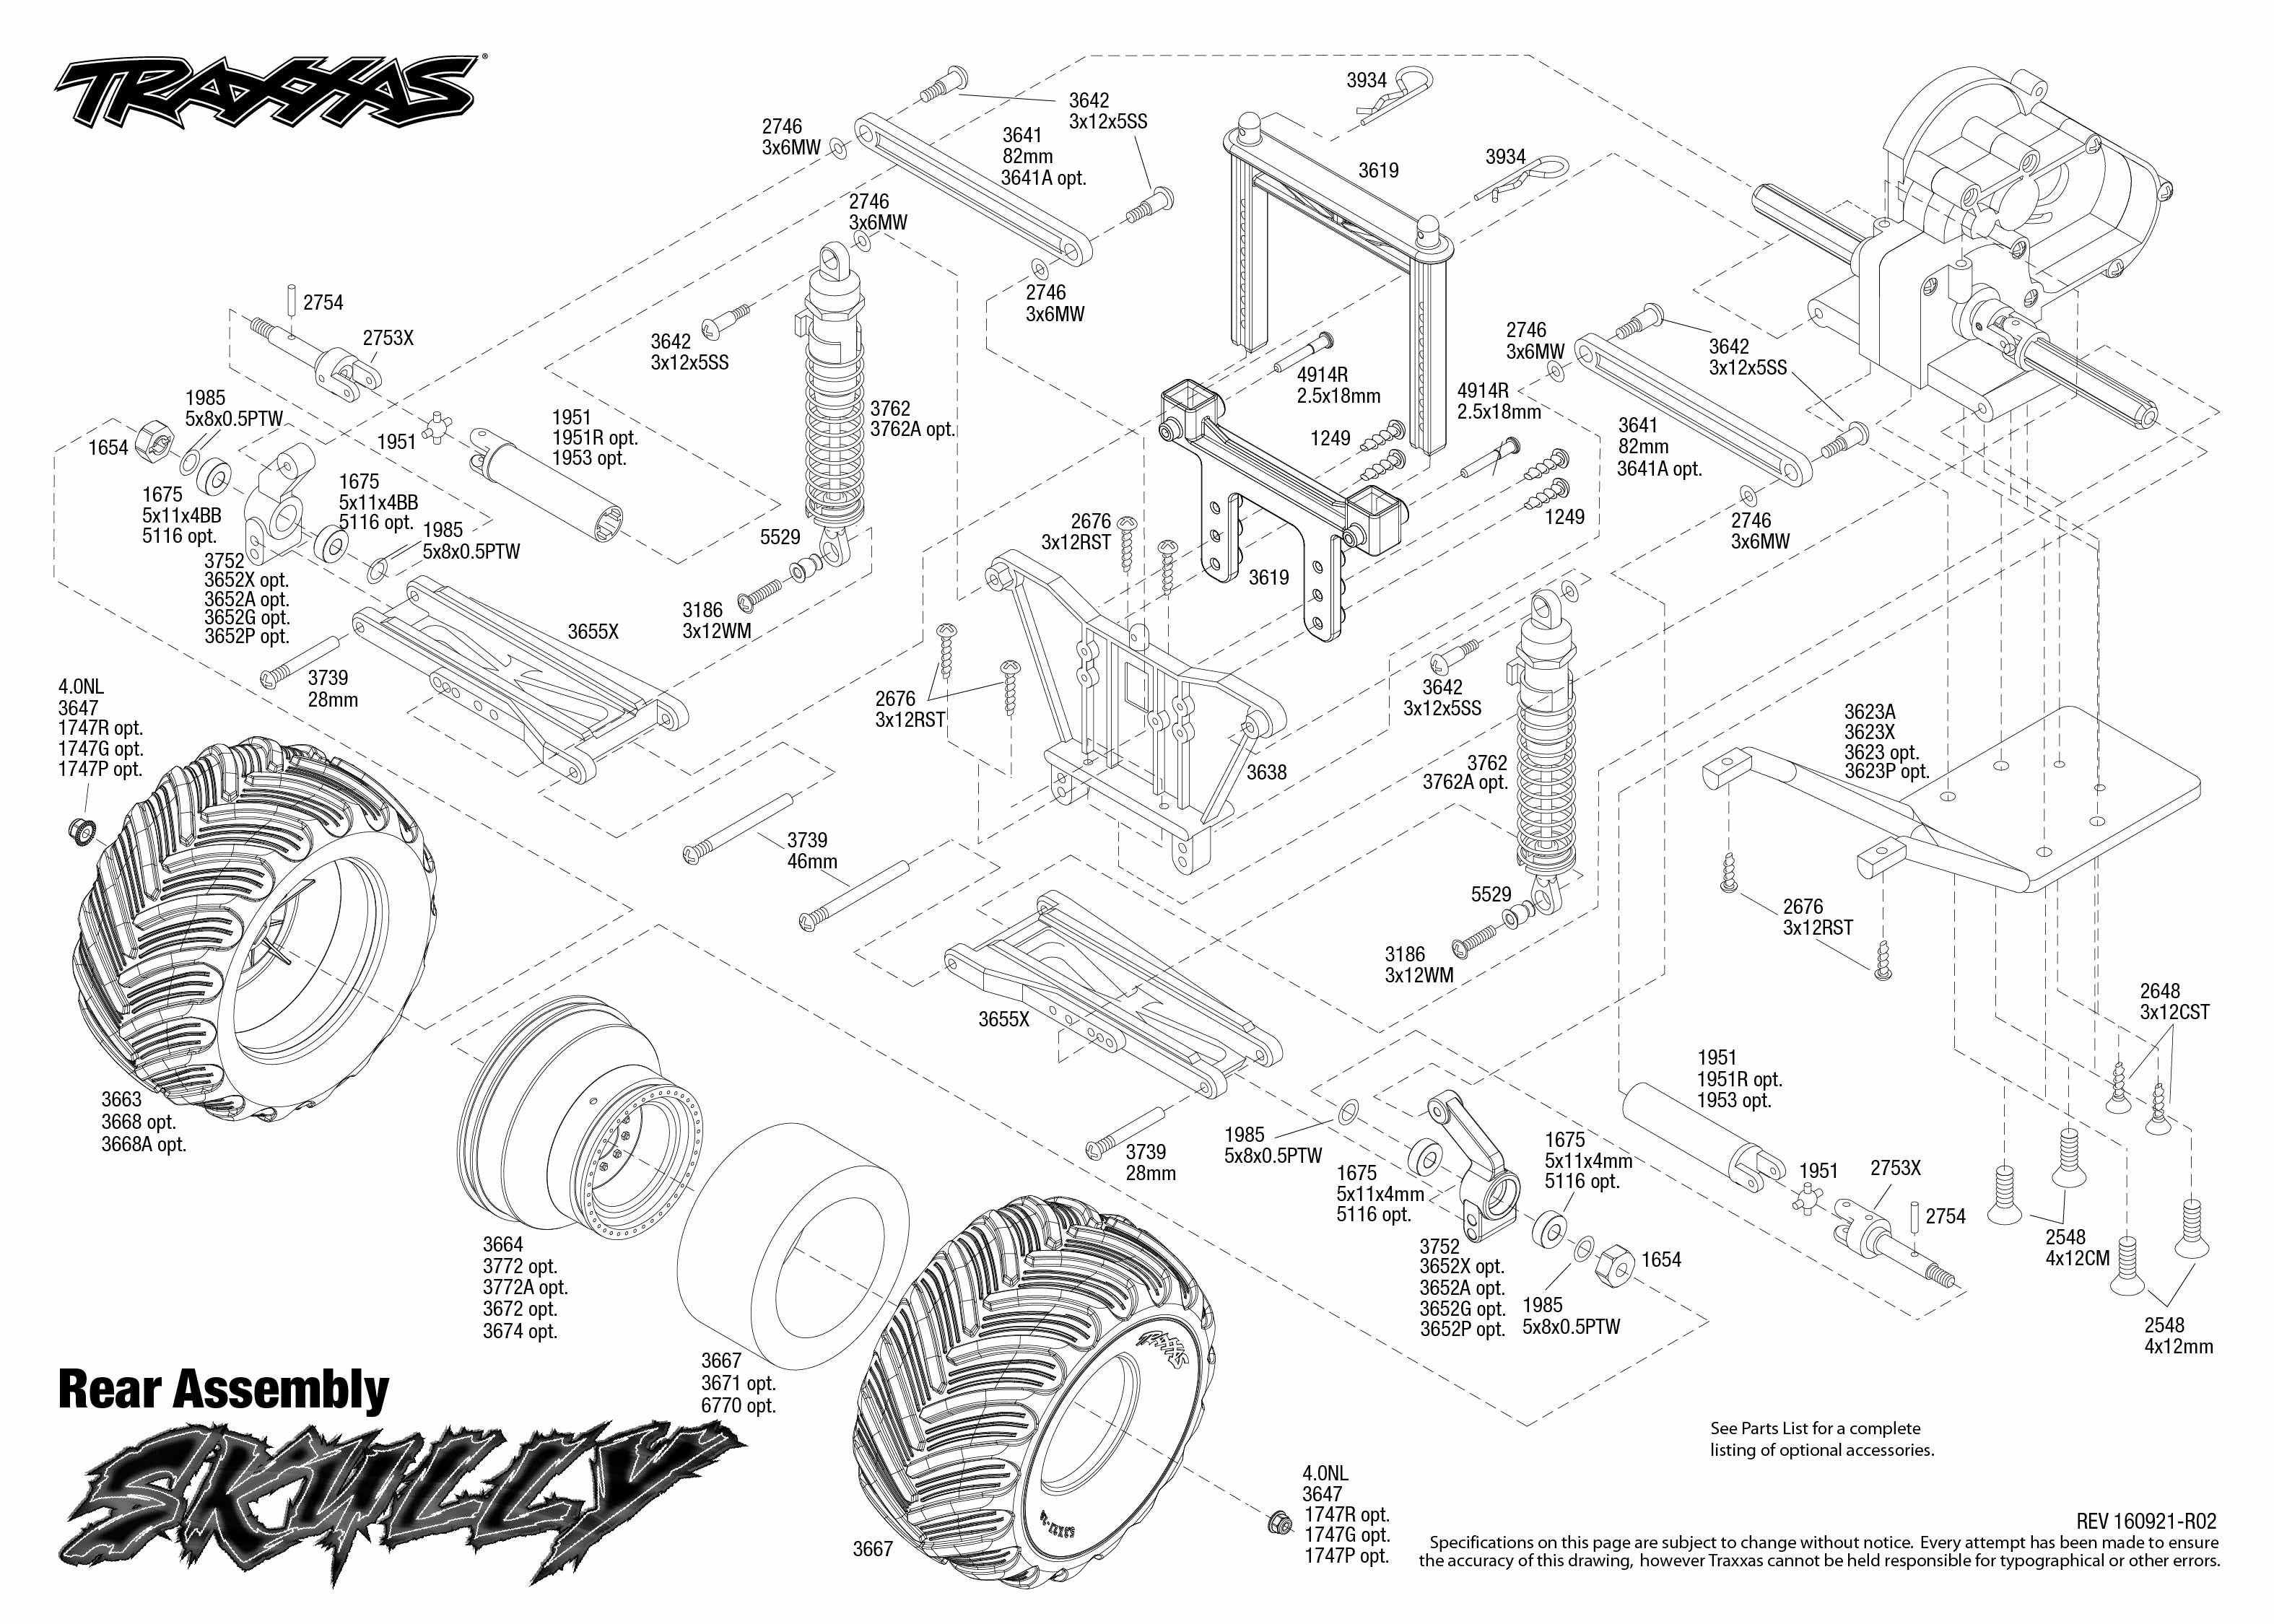 traxxas t maxx 2 5 transmission diagram fender american professional jazzmaster wiring stampede xl parts